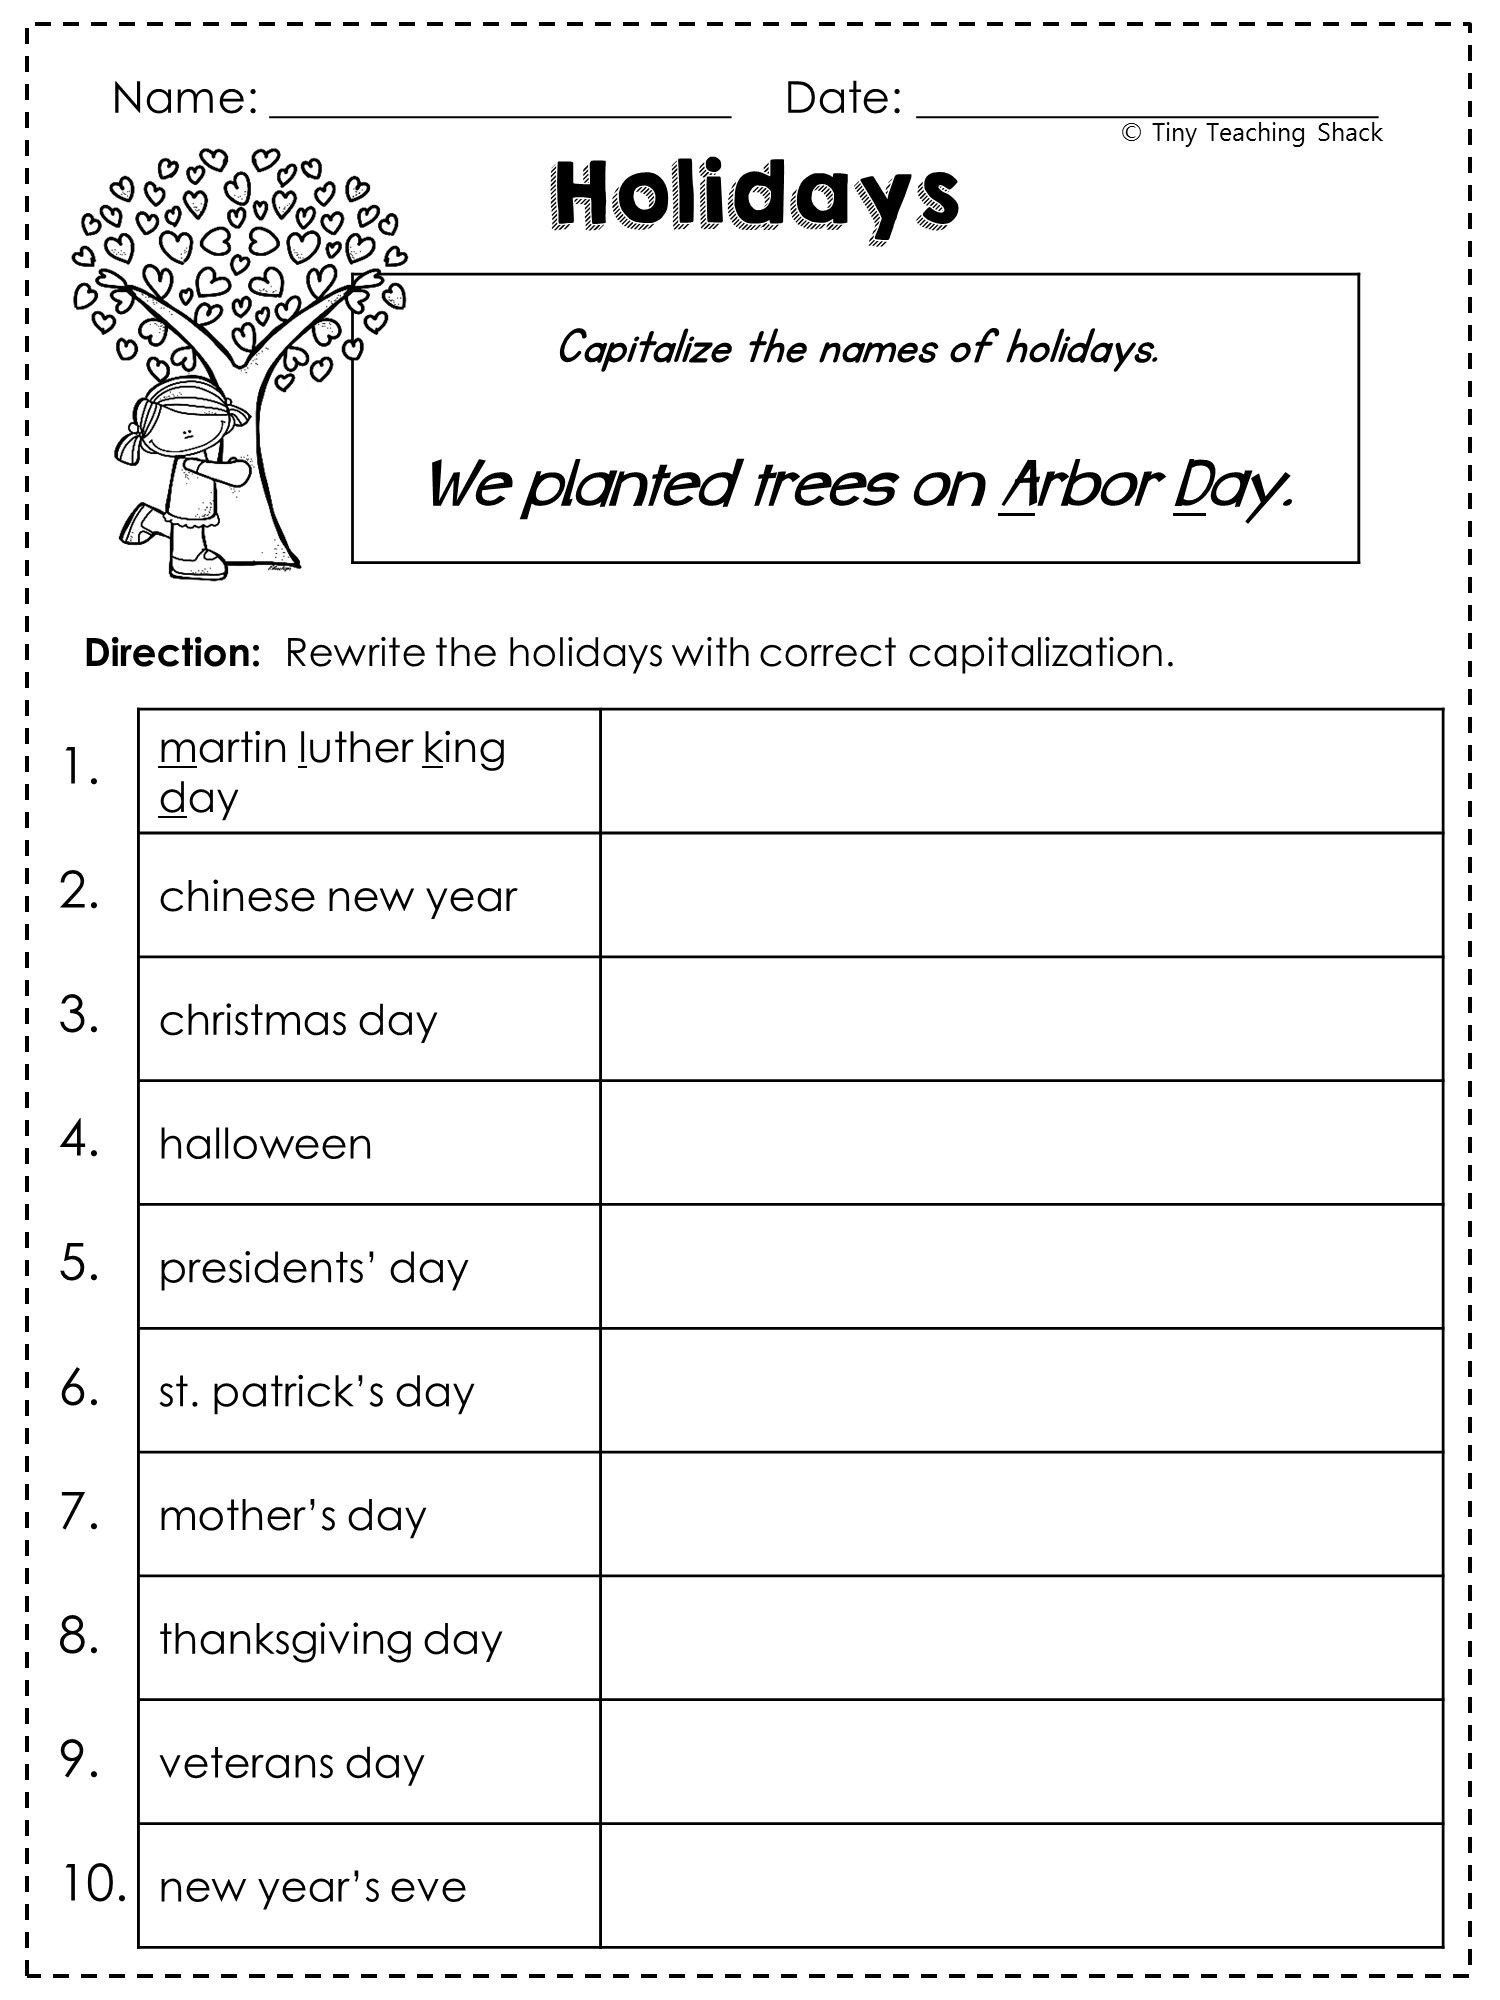 hight resolution of Sentence Correction Worksheets 2nd Grade Proofreading Worksheets 2nd Grade  Free…   Third grade grammar worksheets